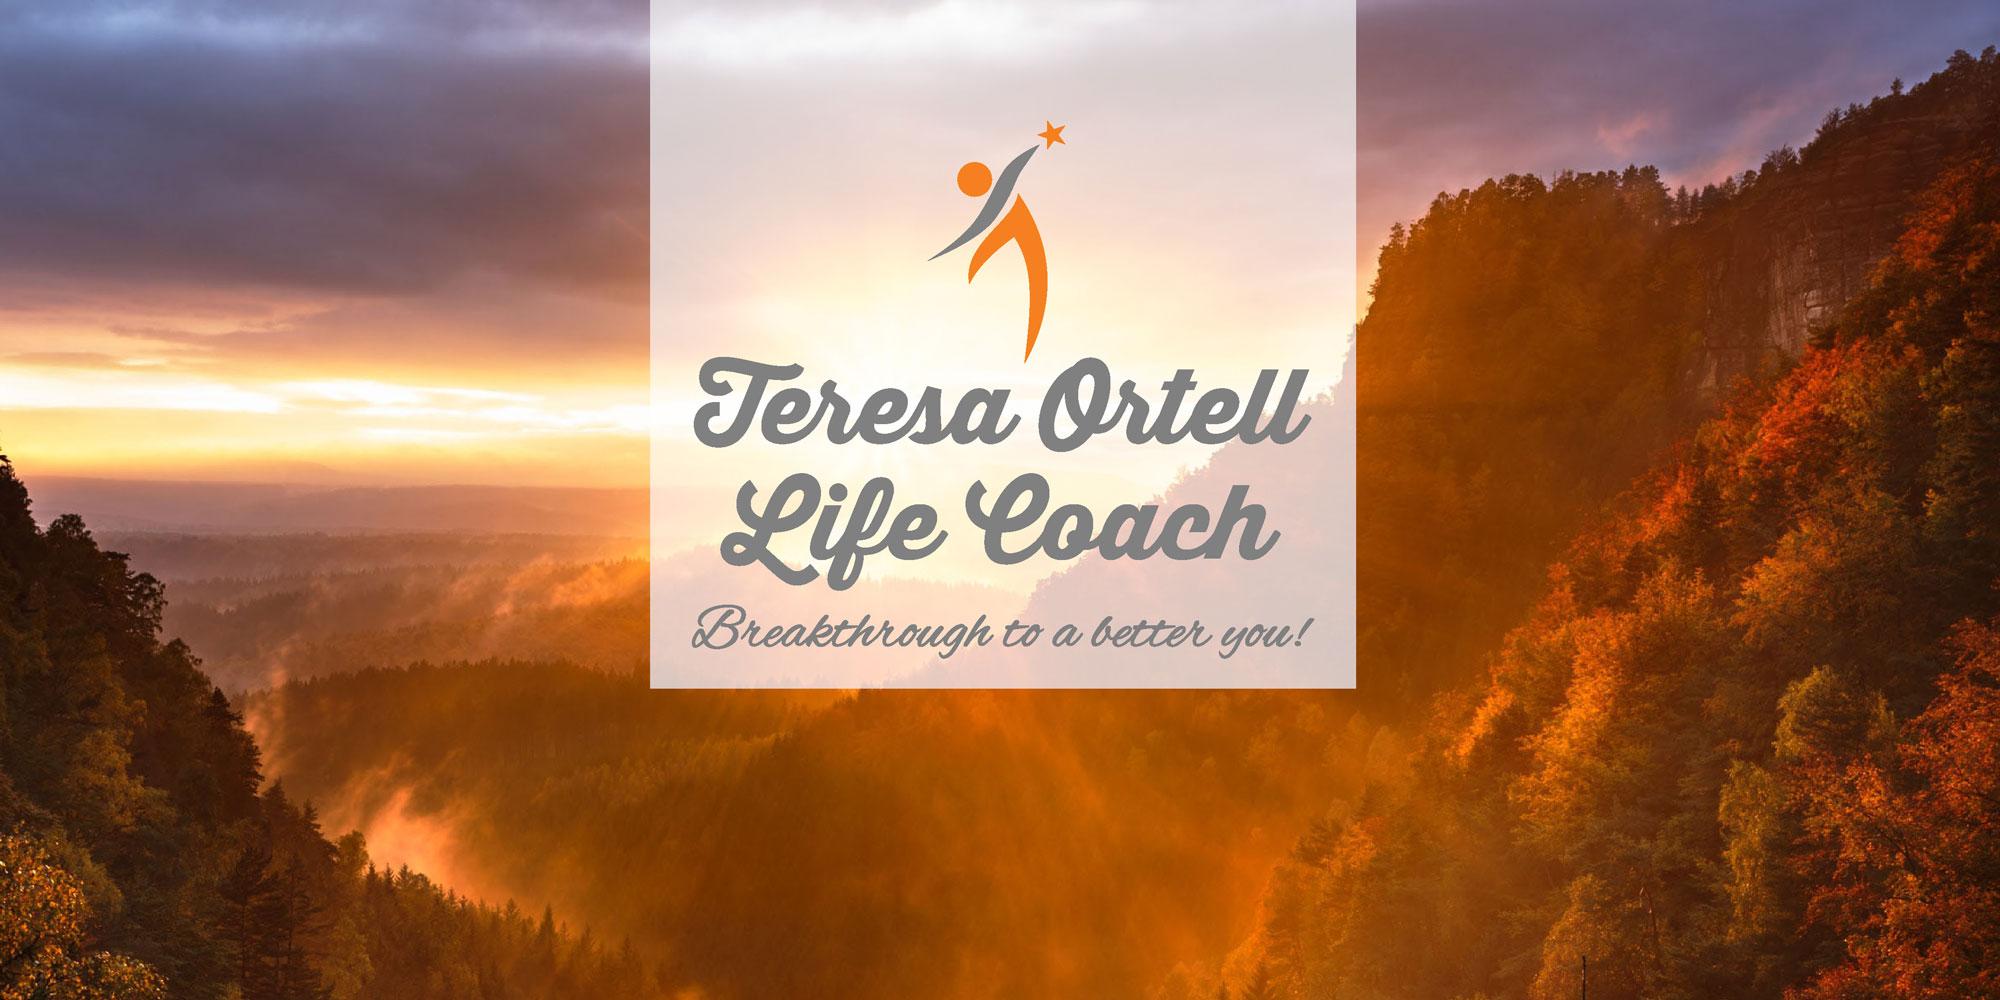 Teresa Ortell, Life Coach